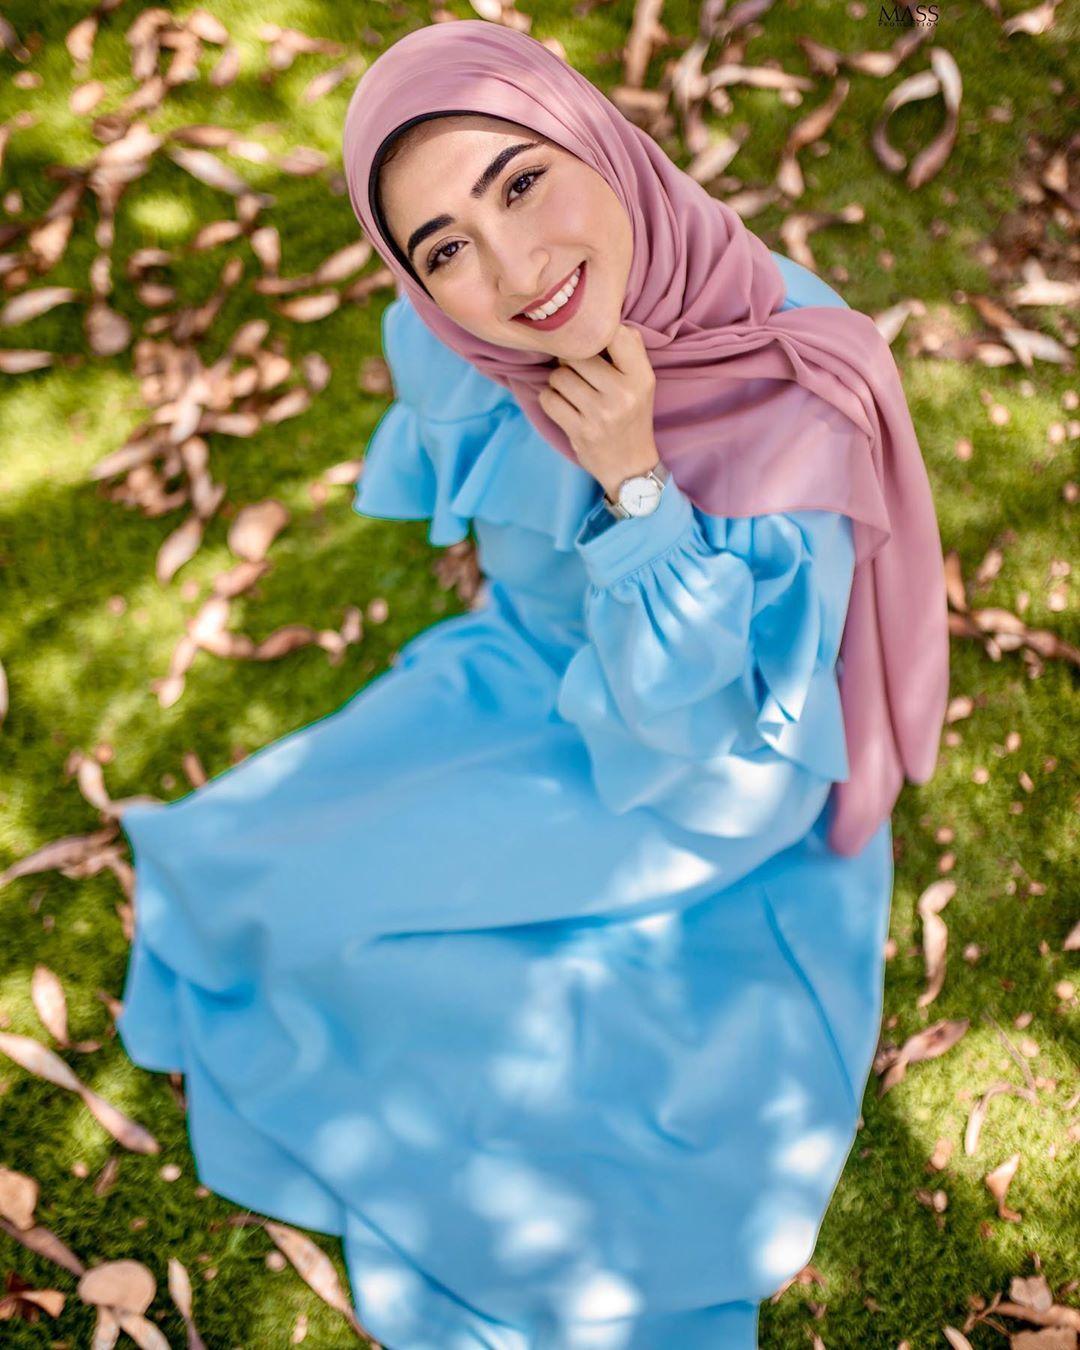 19 5k Likes 193 Comments Esraa Mostafa إسراء م صطفى Esraamostafaofficial On Instagram من ايام الصيف بس بردو بحب الشتا Hijab Fashion Fashion Denim